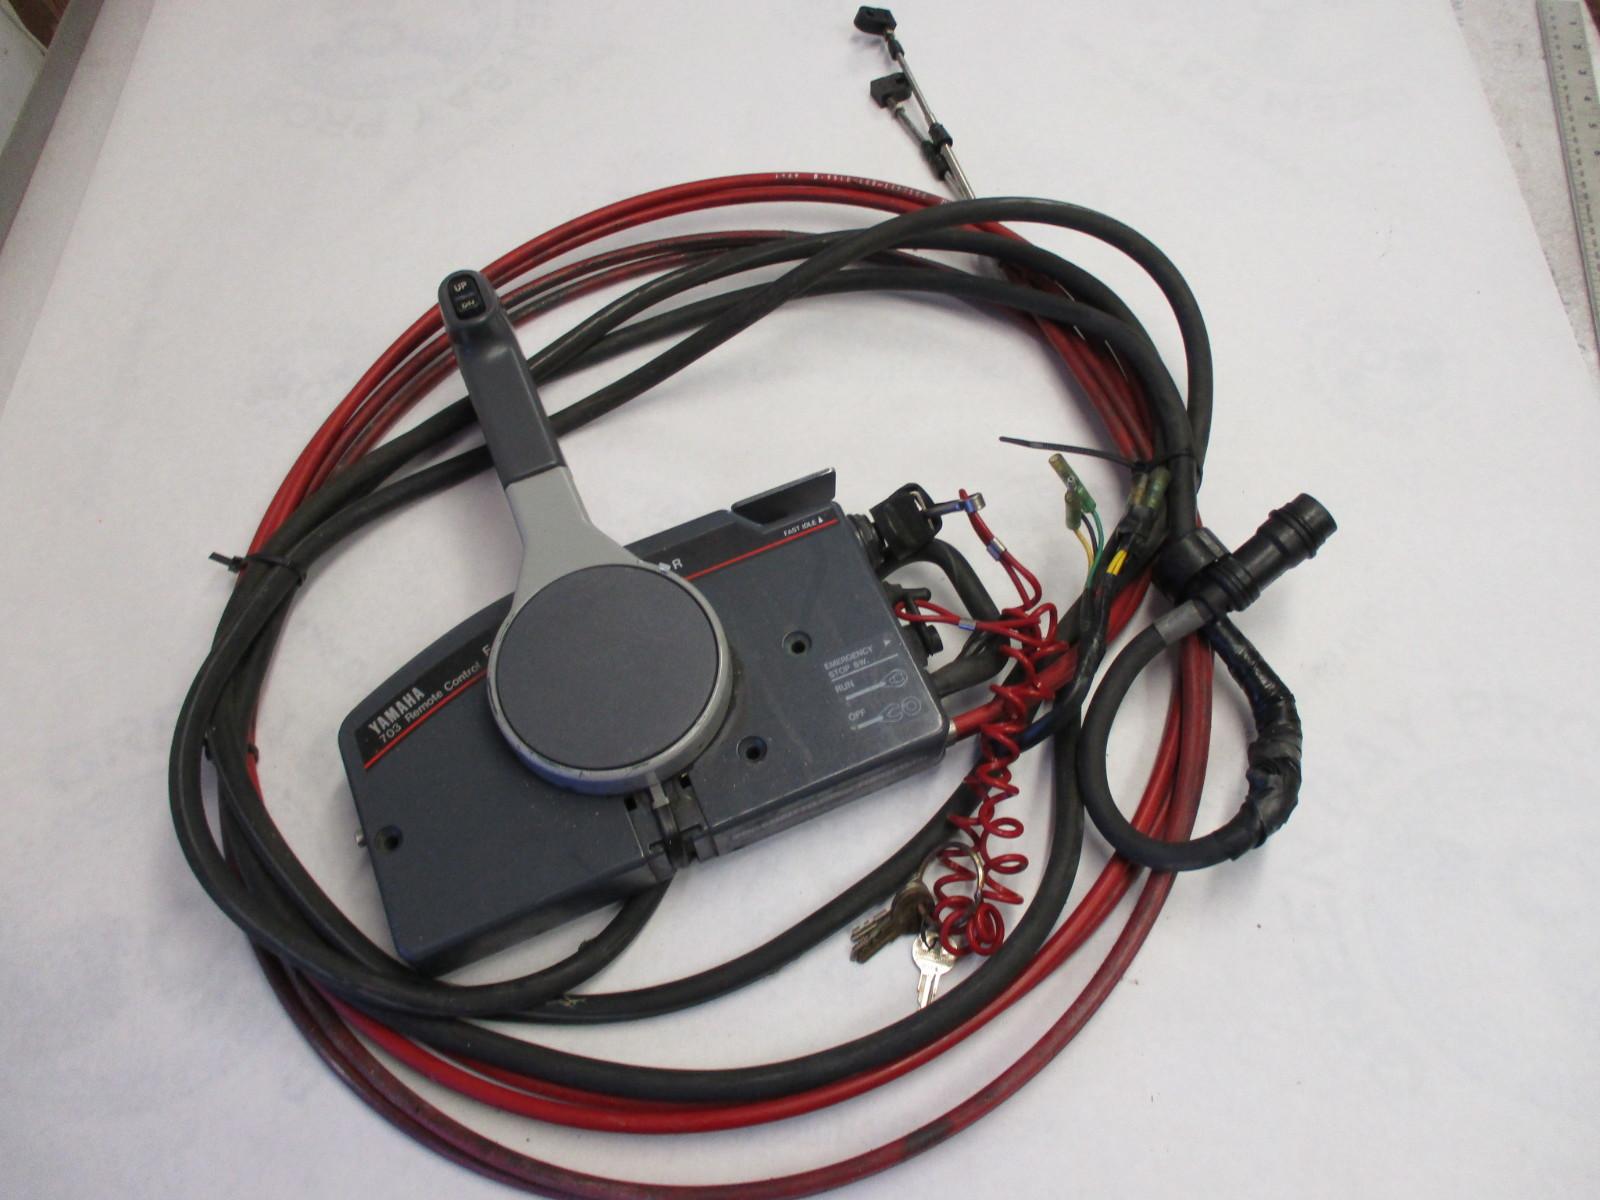 Yamaha 703 Remote Control Wiring Diagram Yamaha Outboard Remote